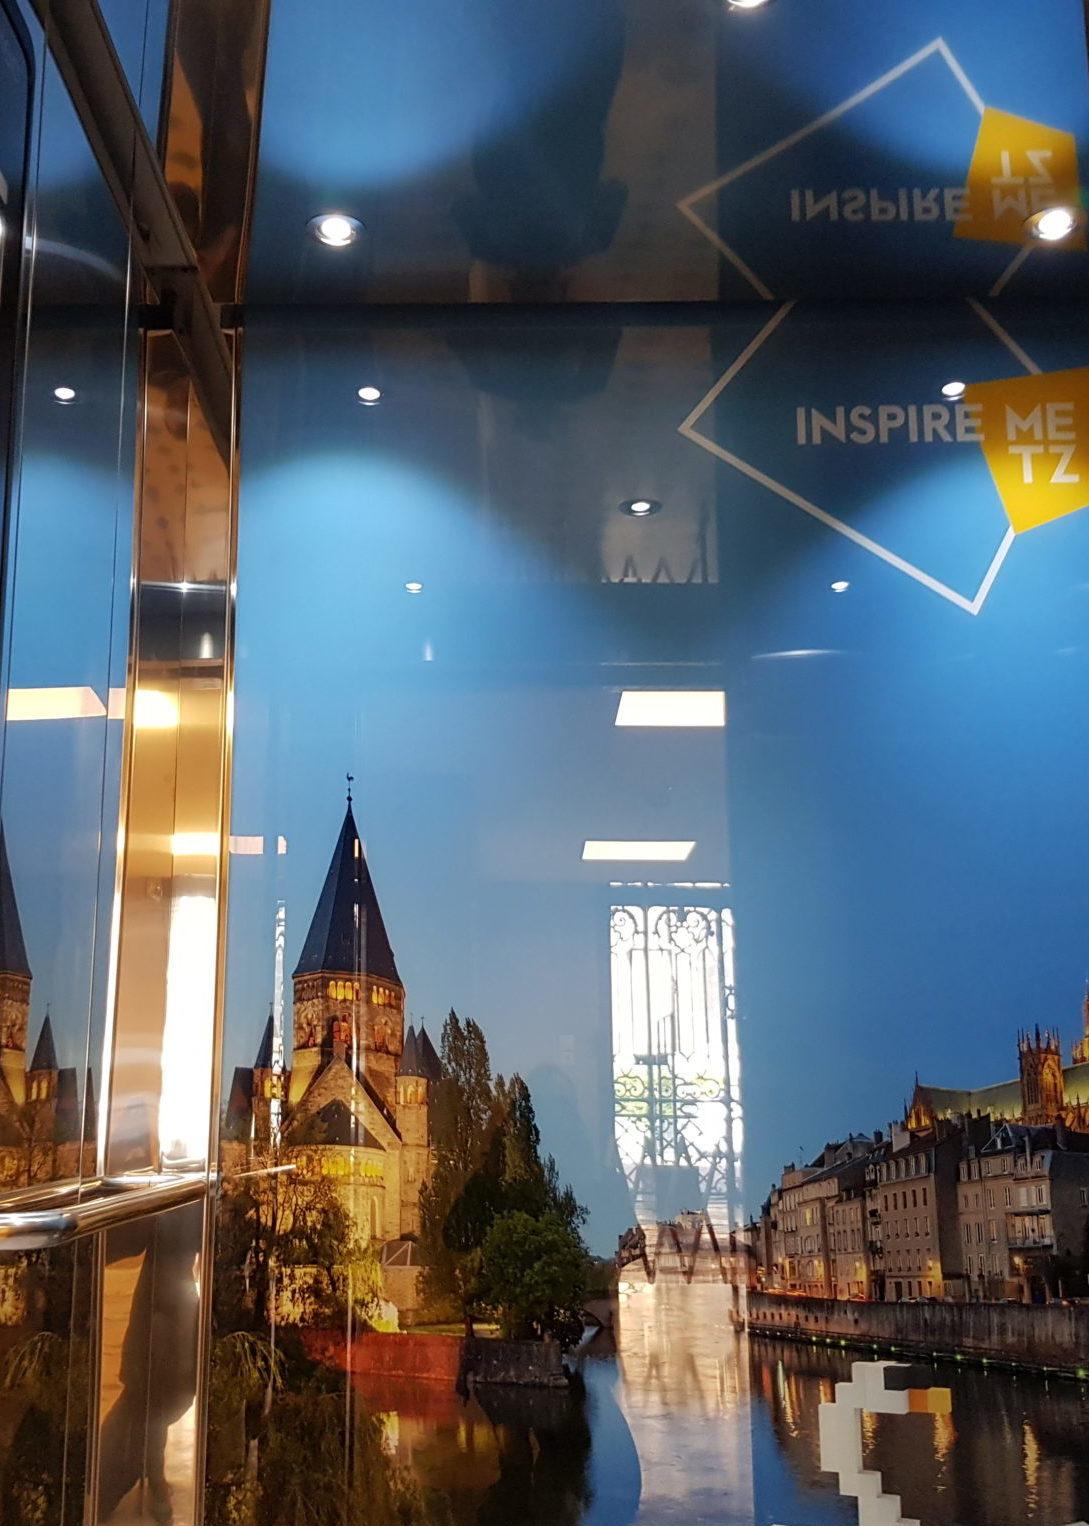 Hôtel de ville Metz